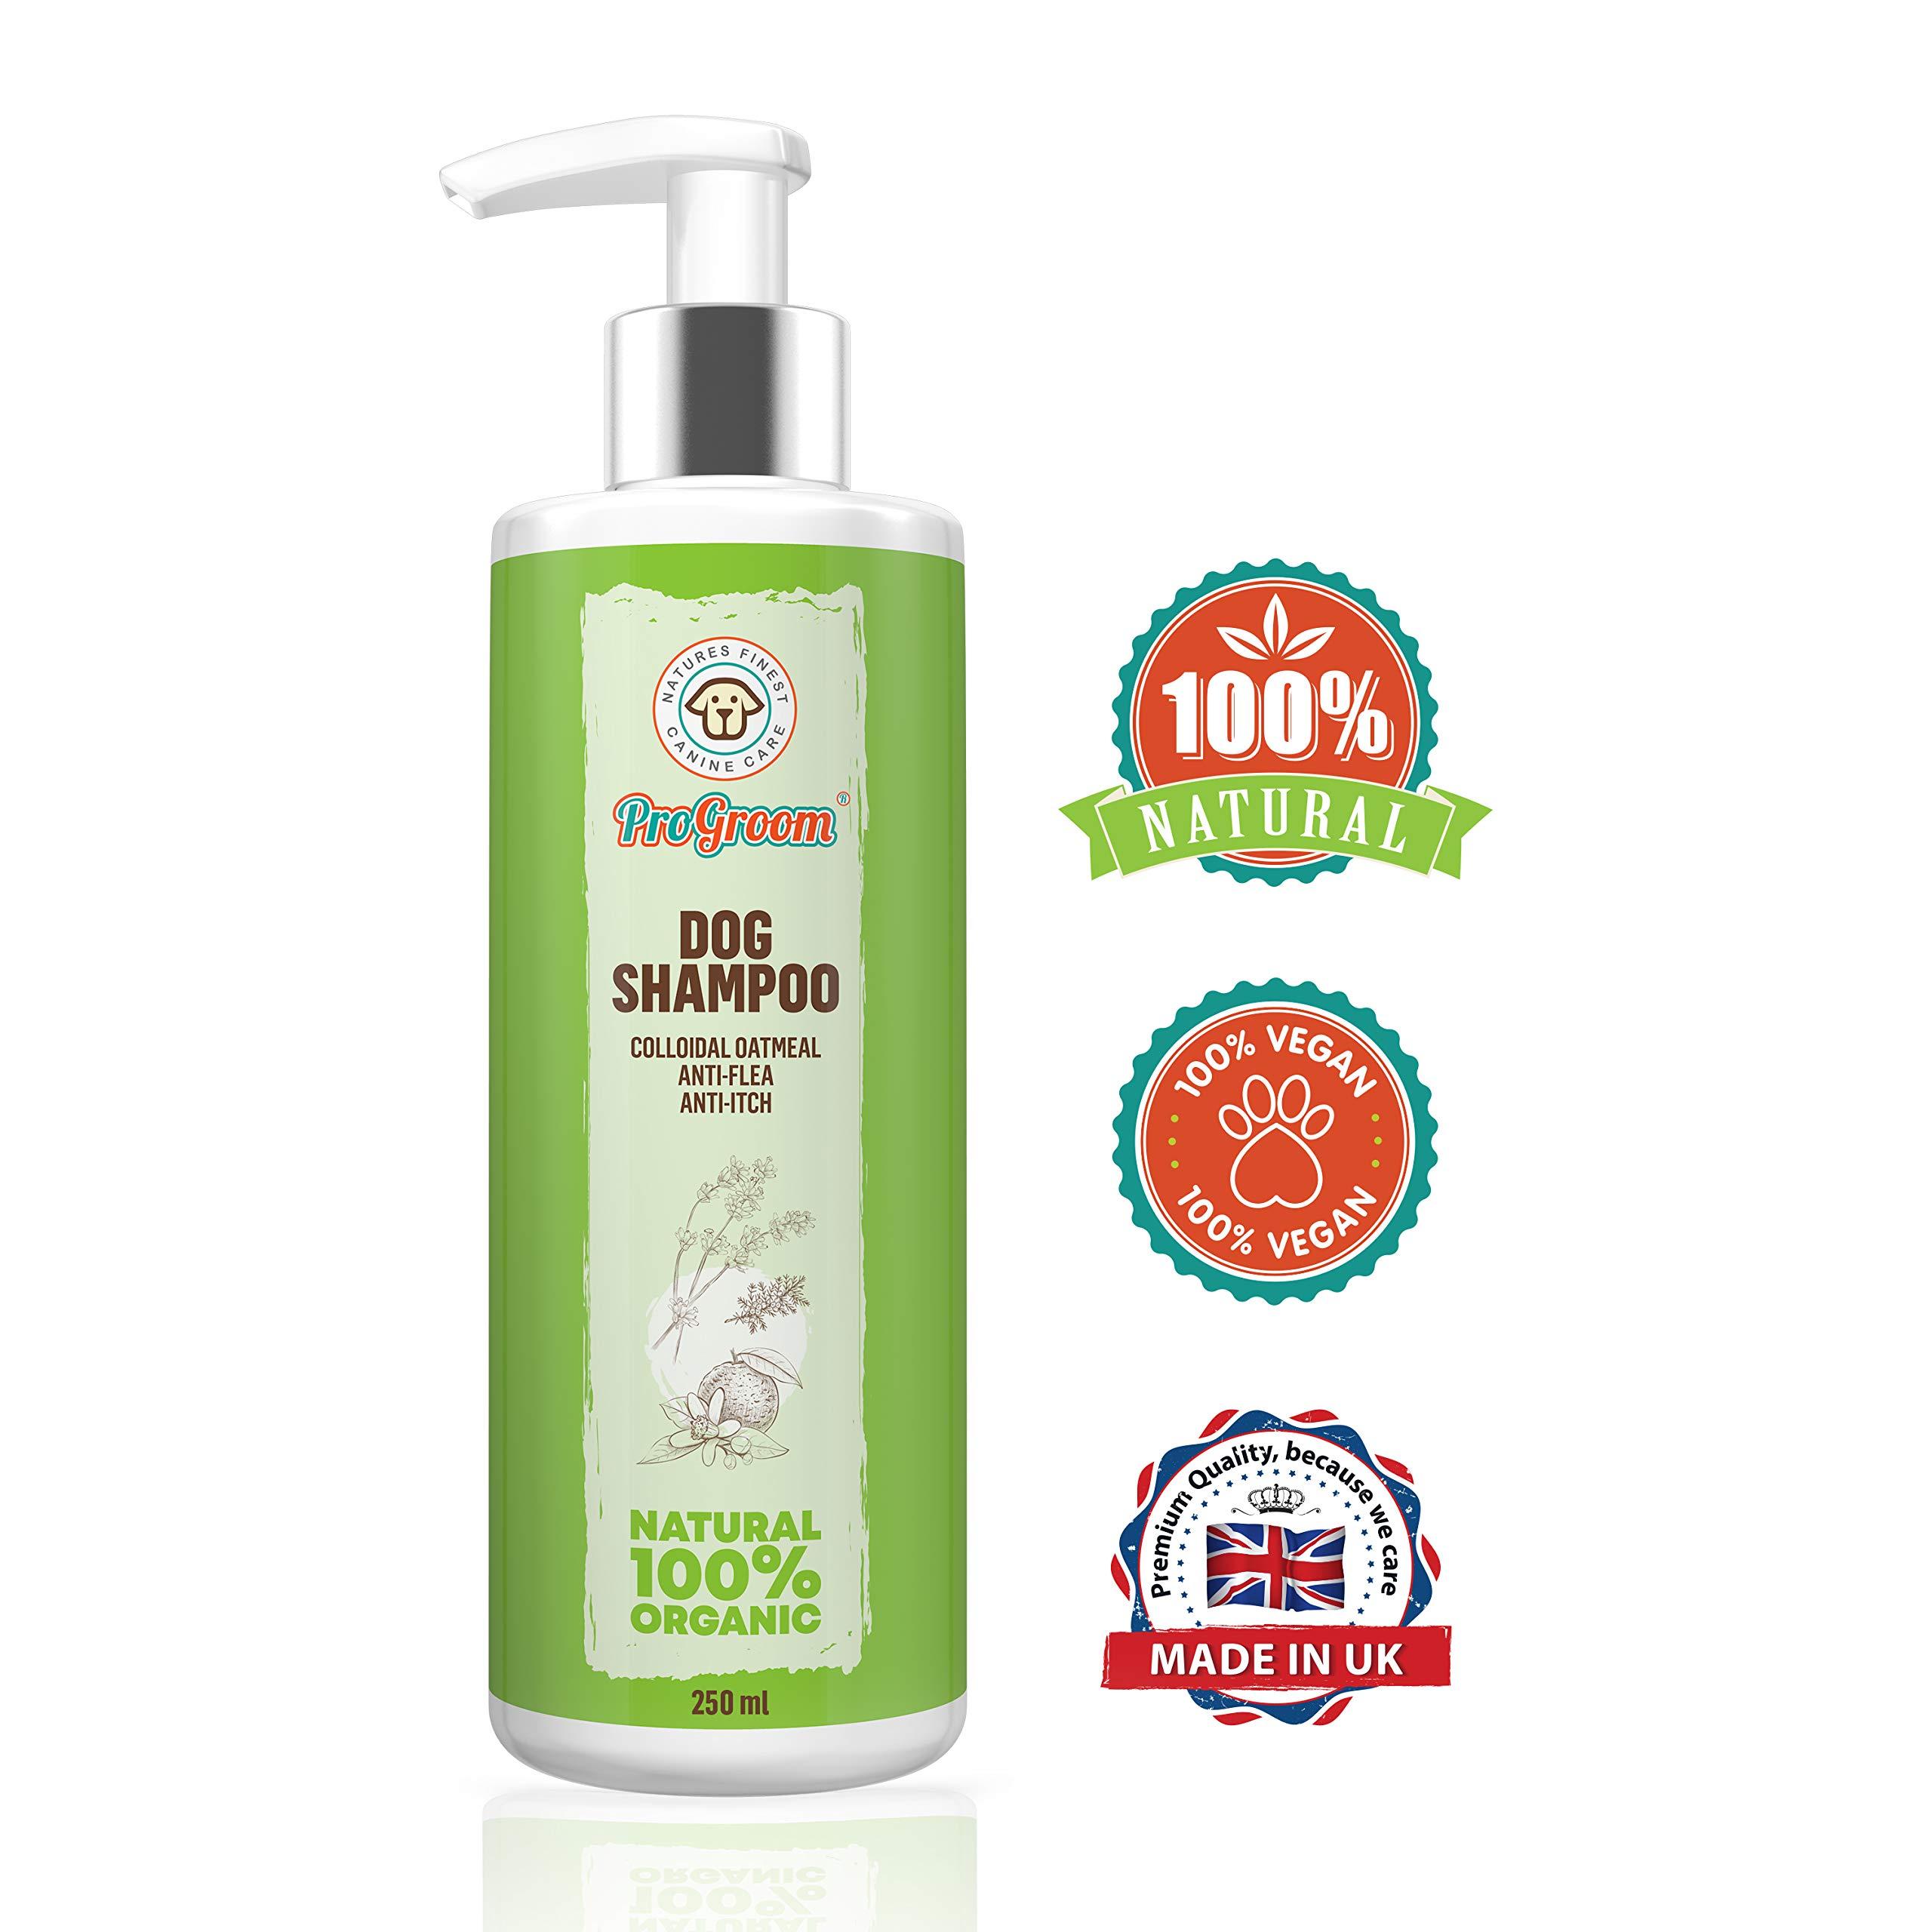 progroom Oatmeal Dog Shampoo Natural and Organic – Puppy Shampoo and Itchy Skin Formula – Grooming Puppy Sensitive…